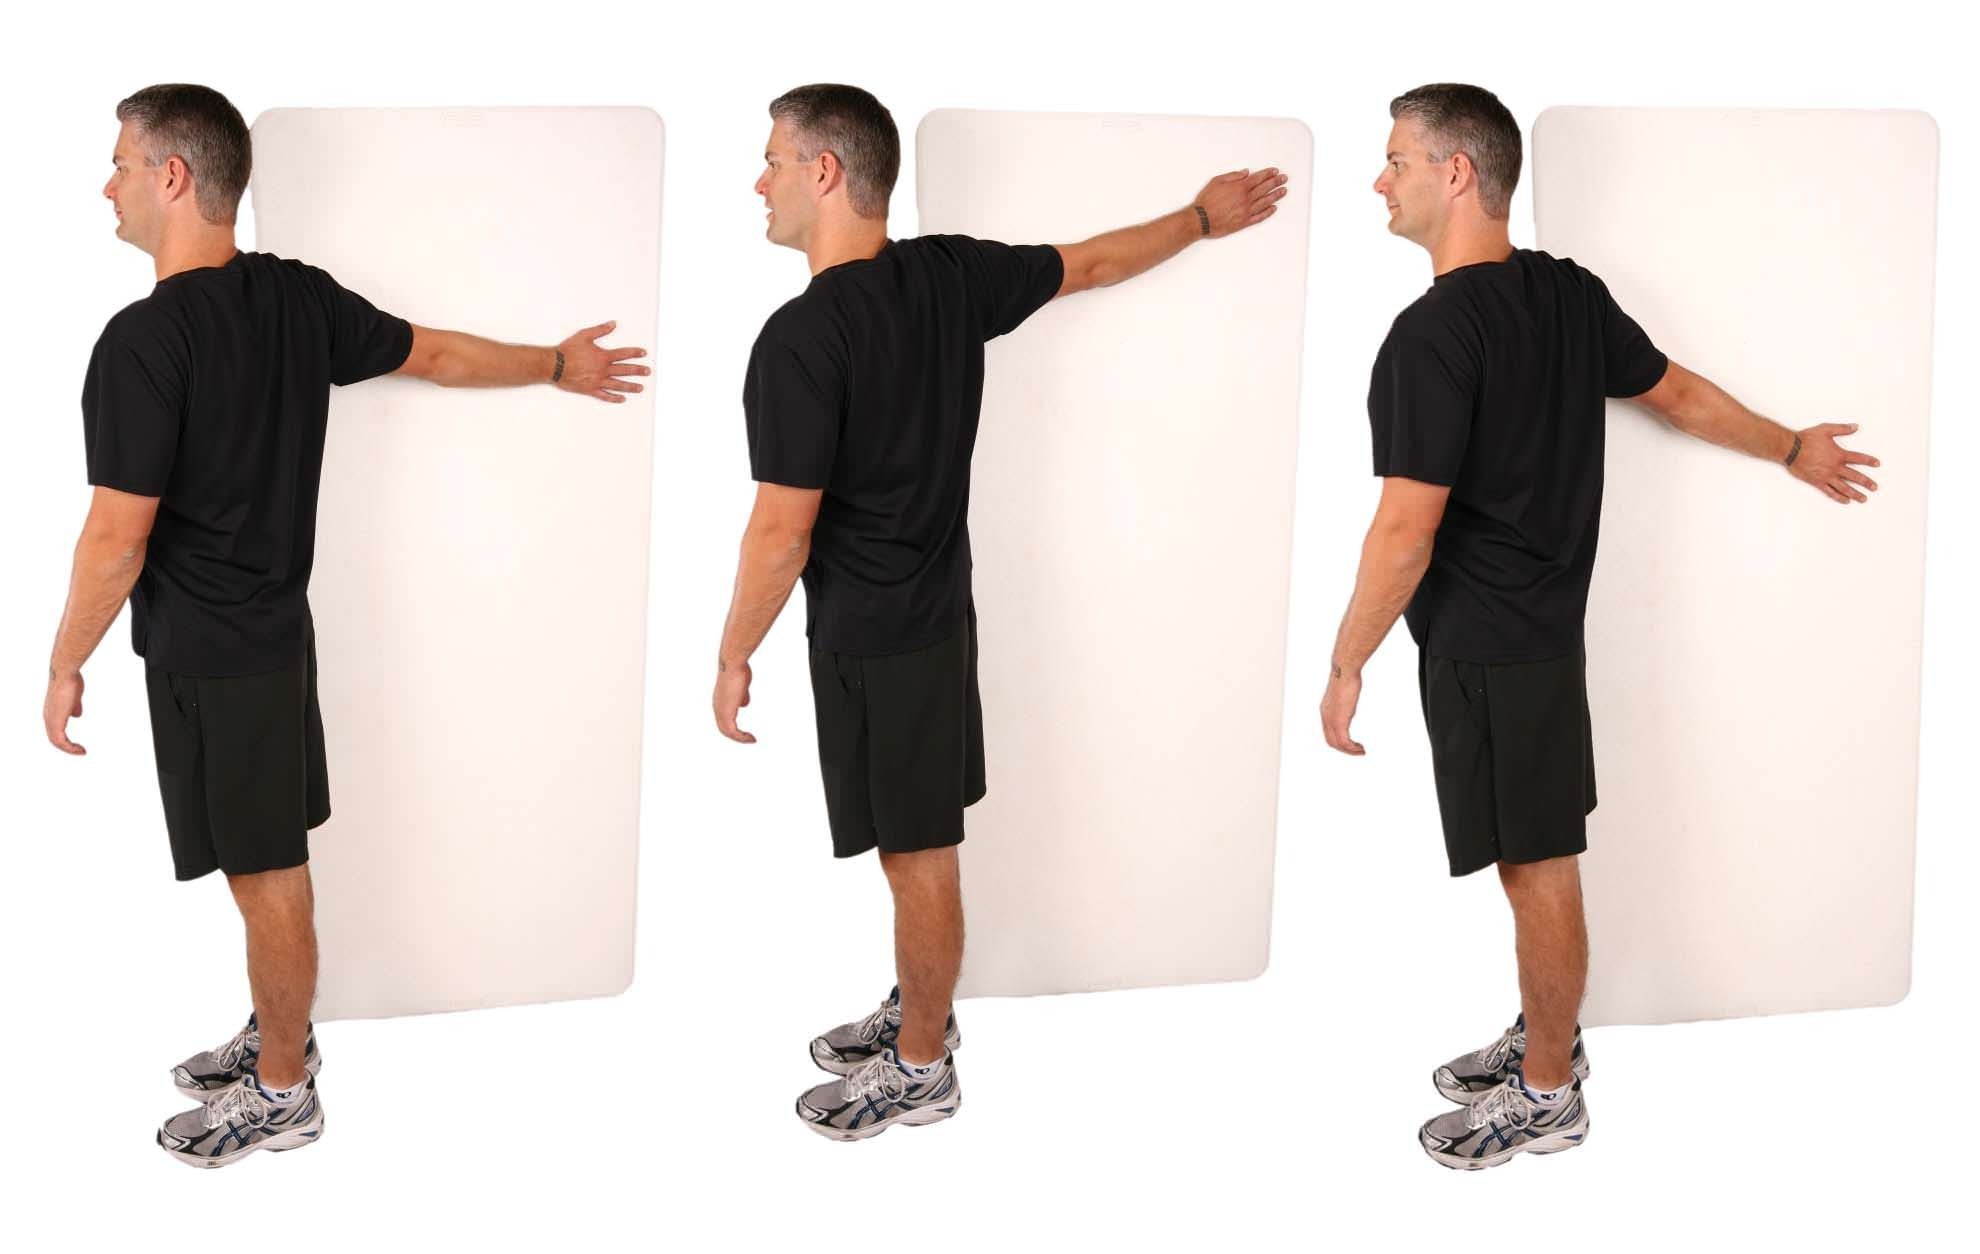 How To Improve Posture Pectoralis Major Stretch Toronto